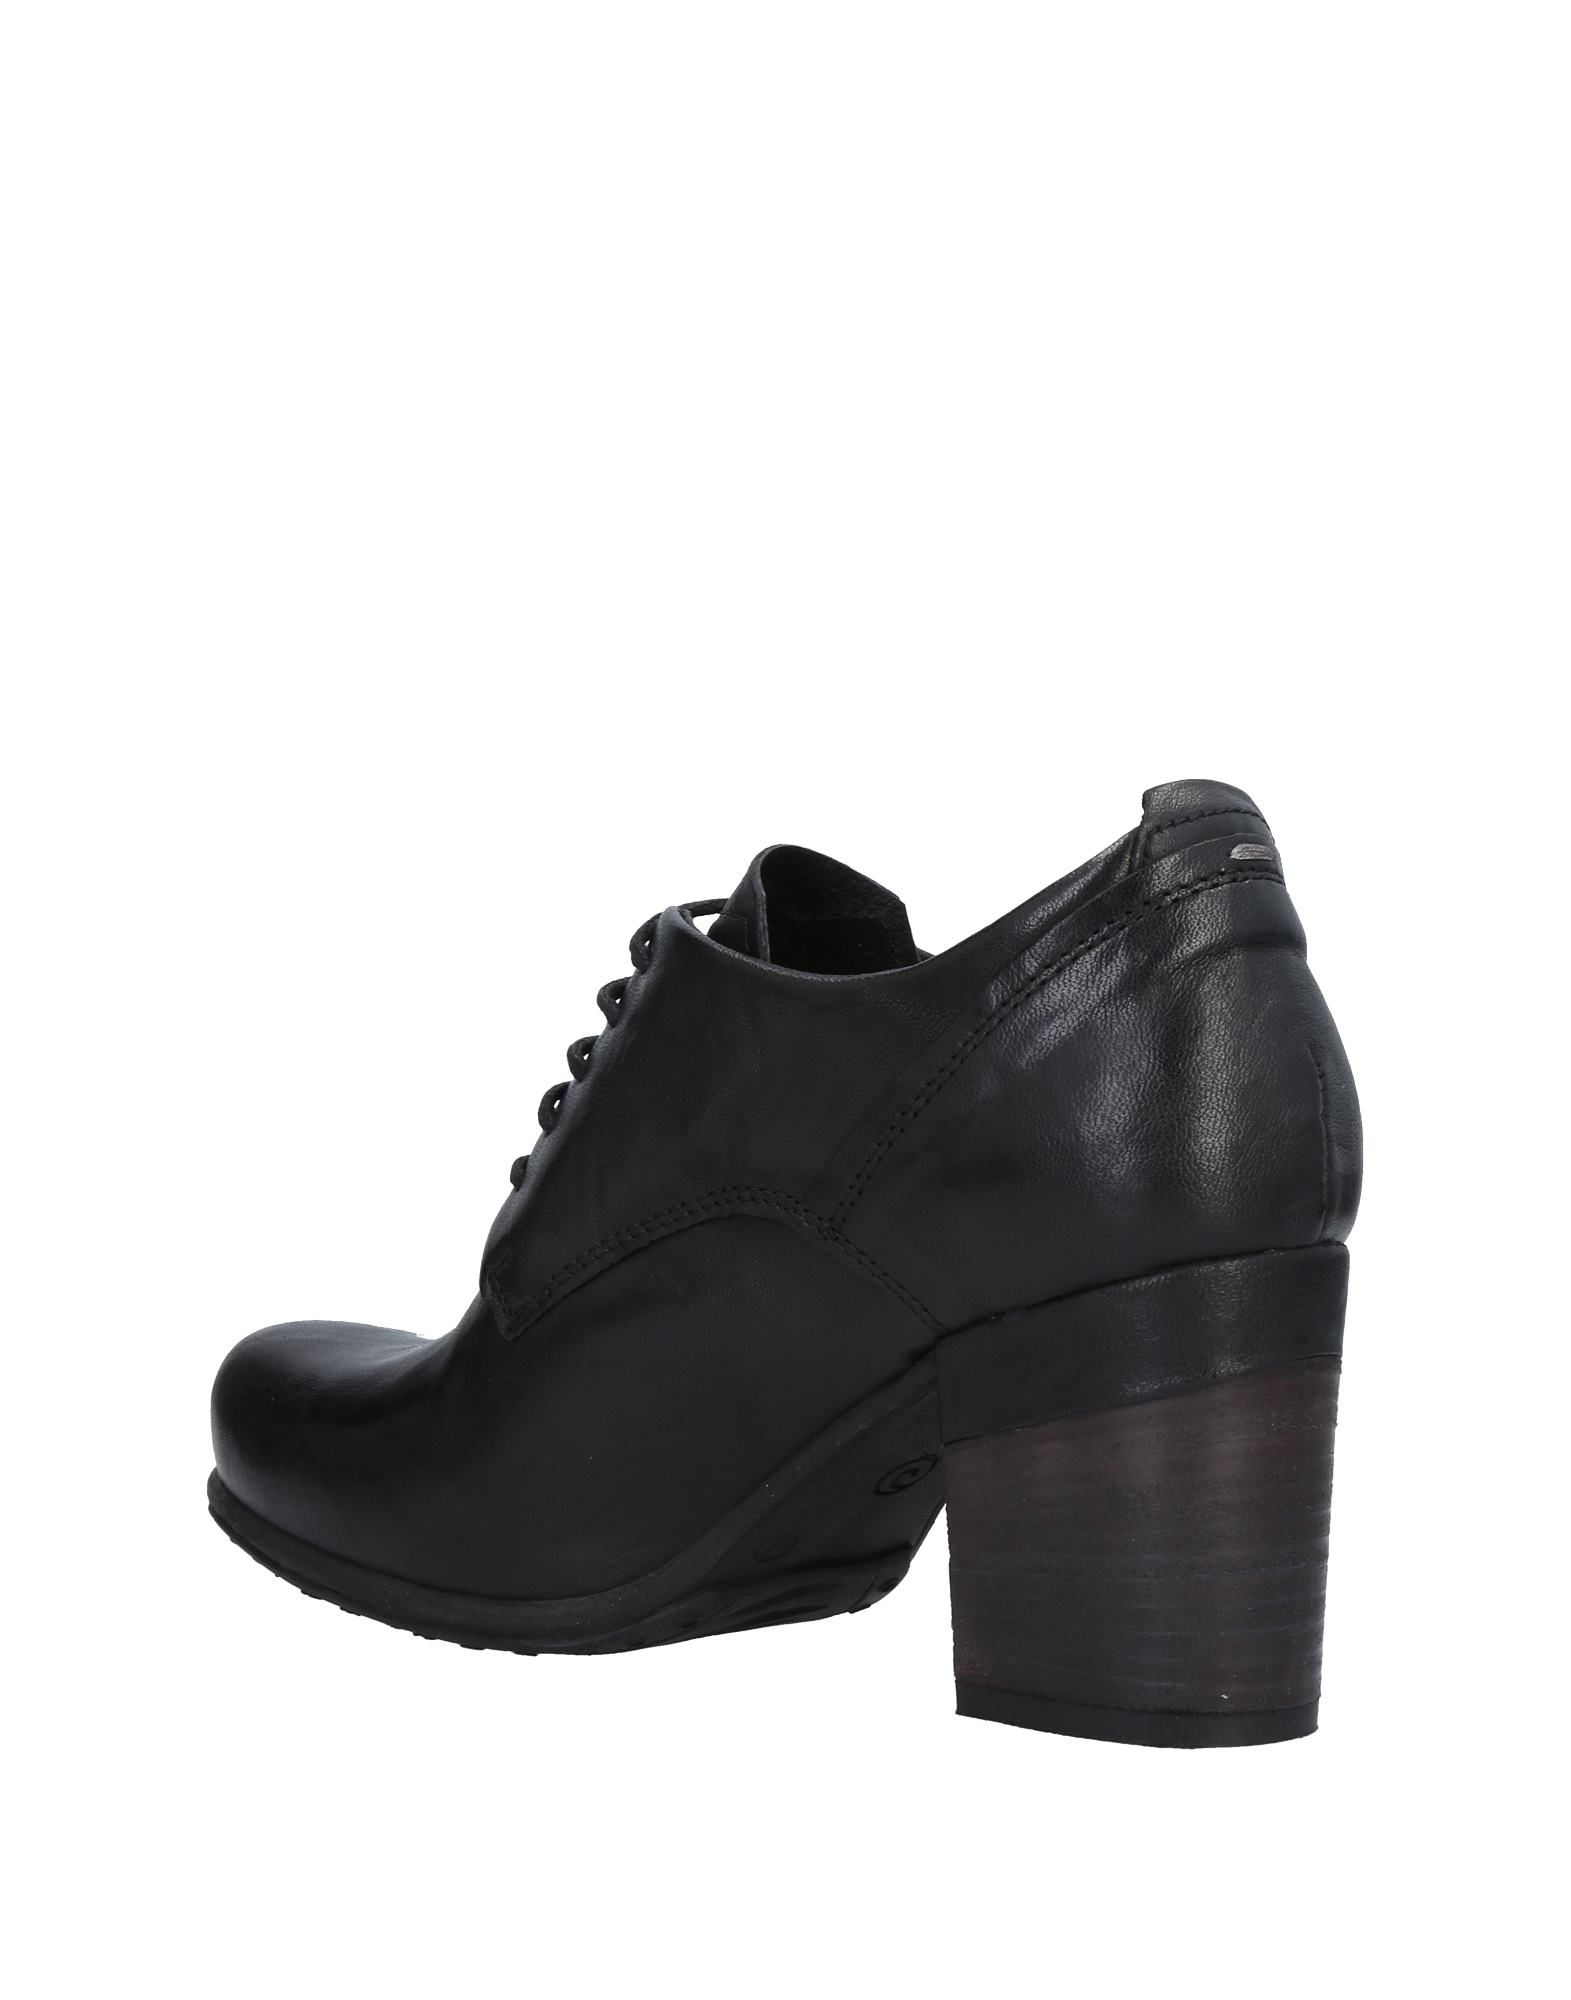 Khrio' Gute Schnürschuhe Damen  11477435DQ Gute Khrio' Qualität beliebte Schuhe 22624d